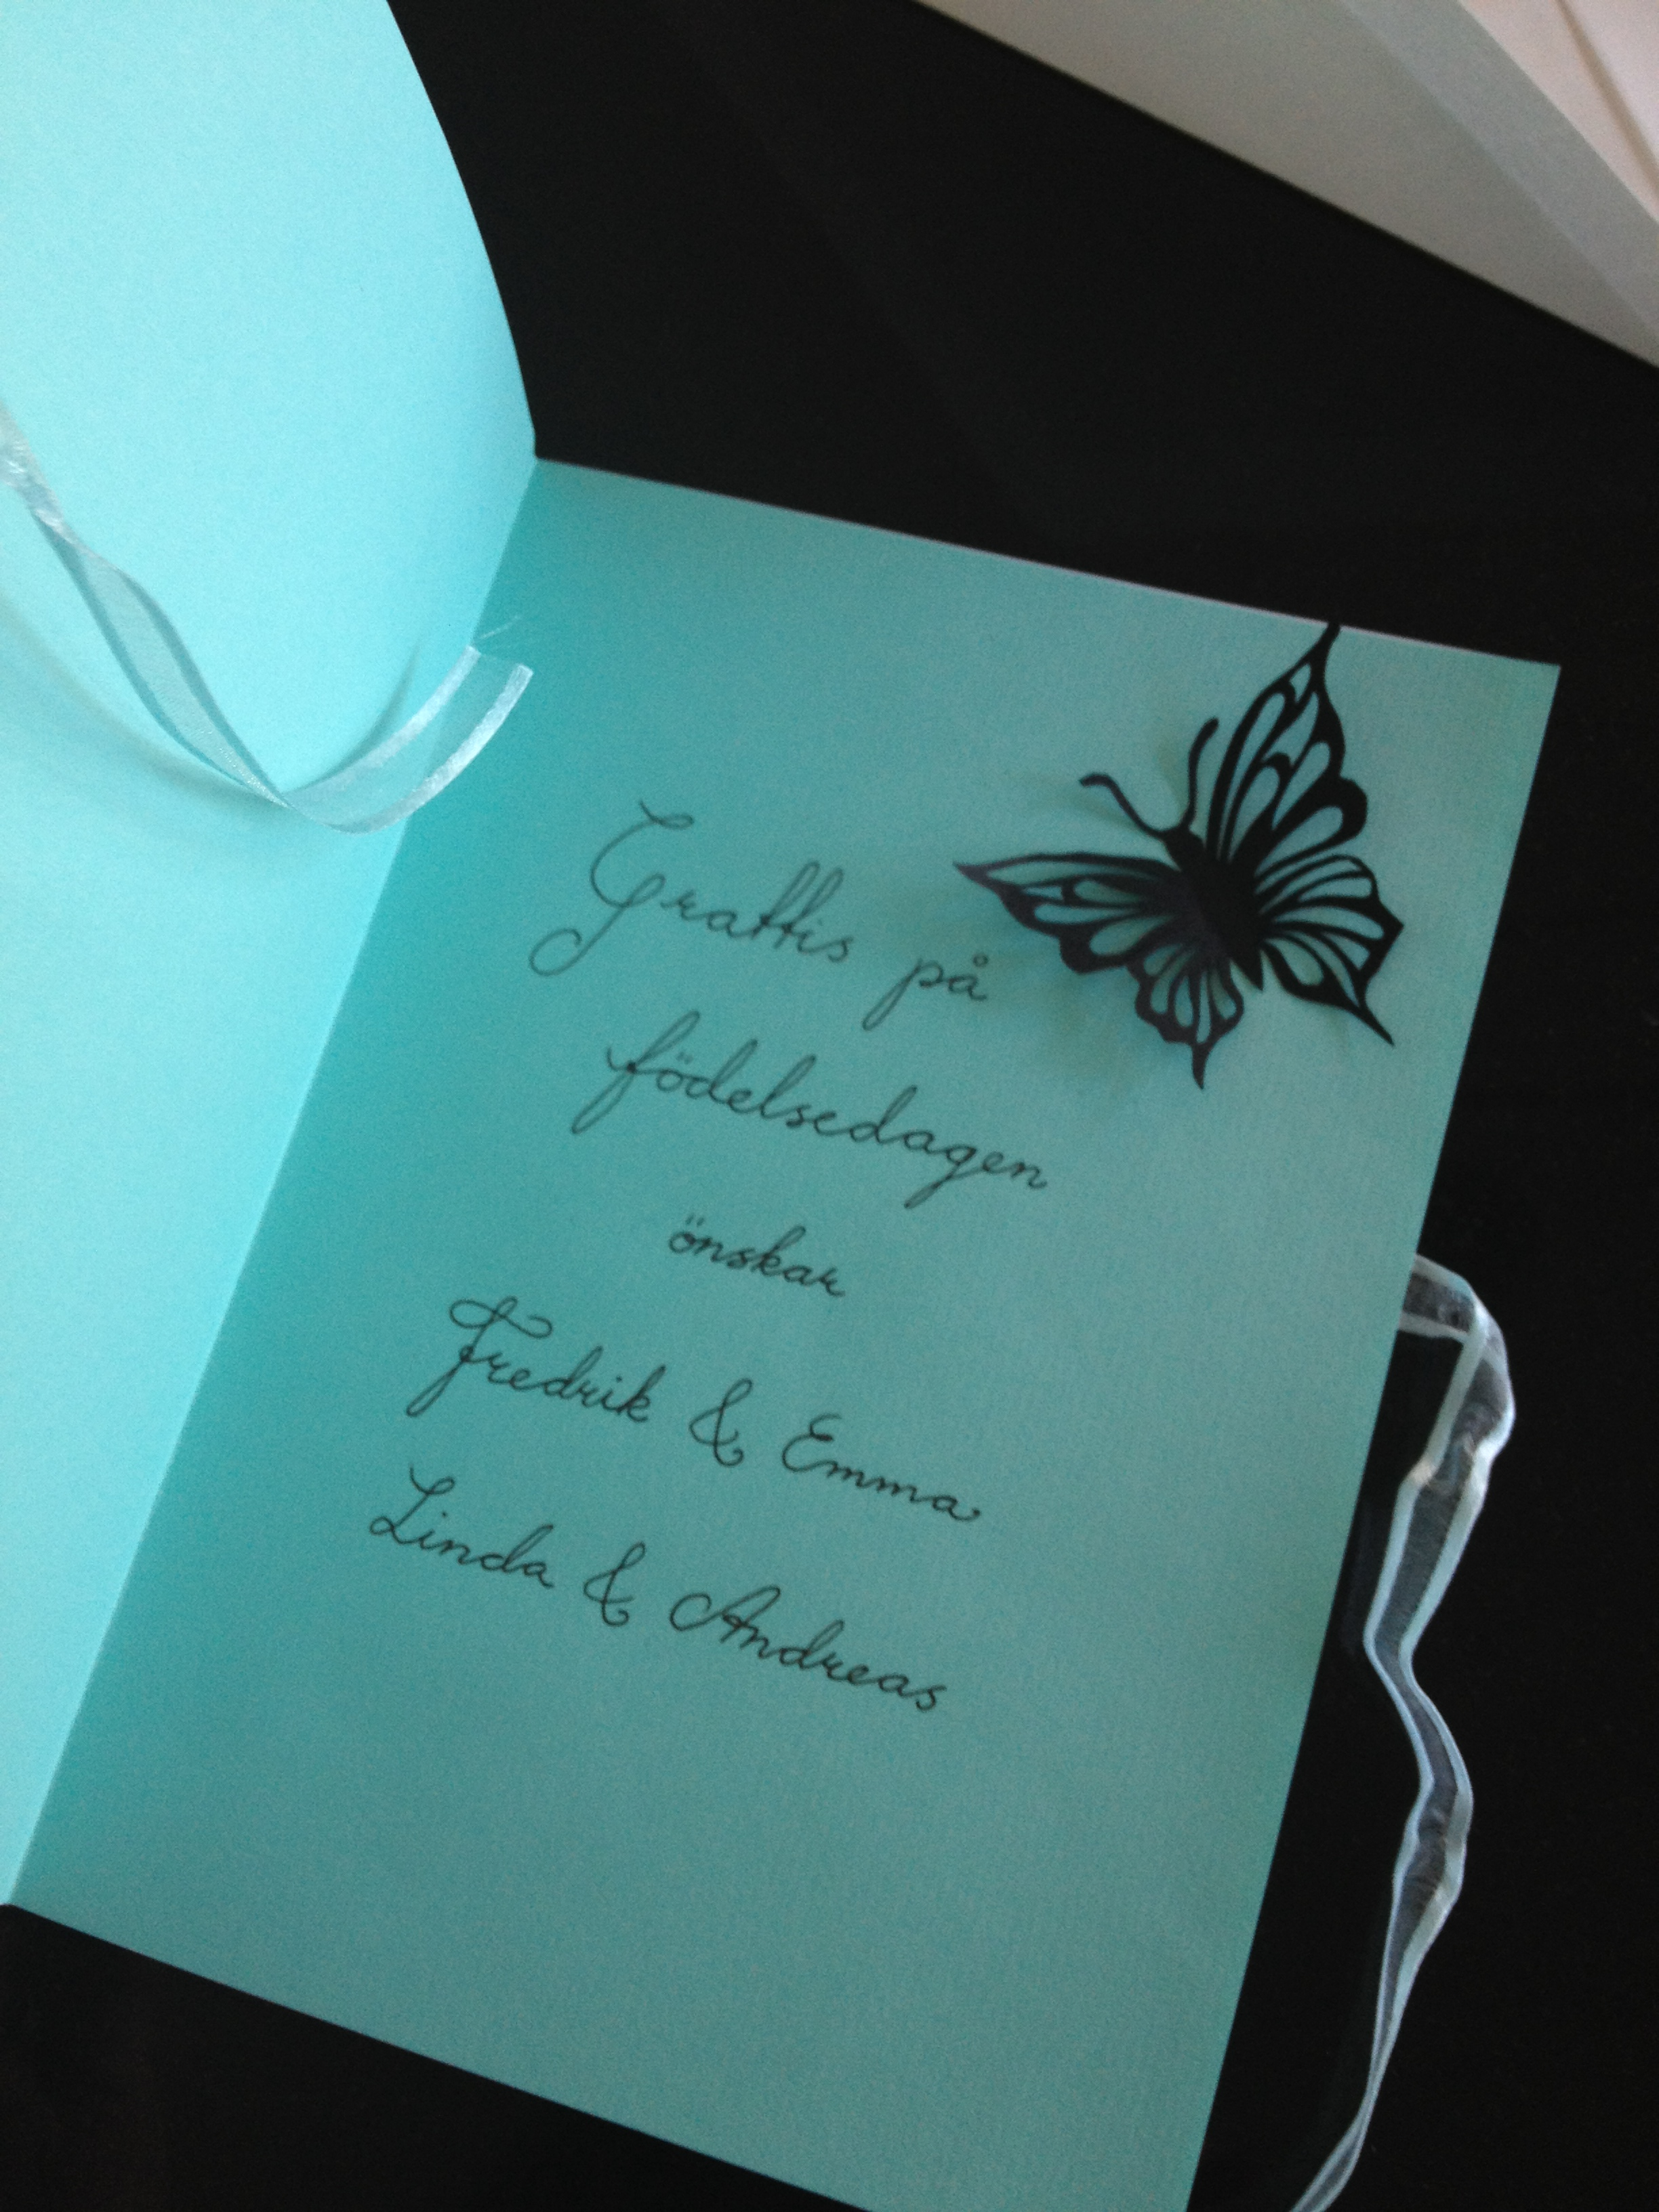 Fdelsedagskort Birthday Card